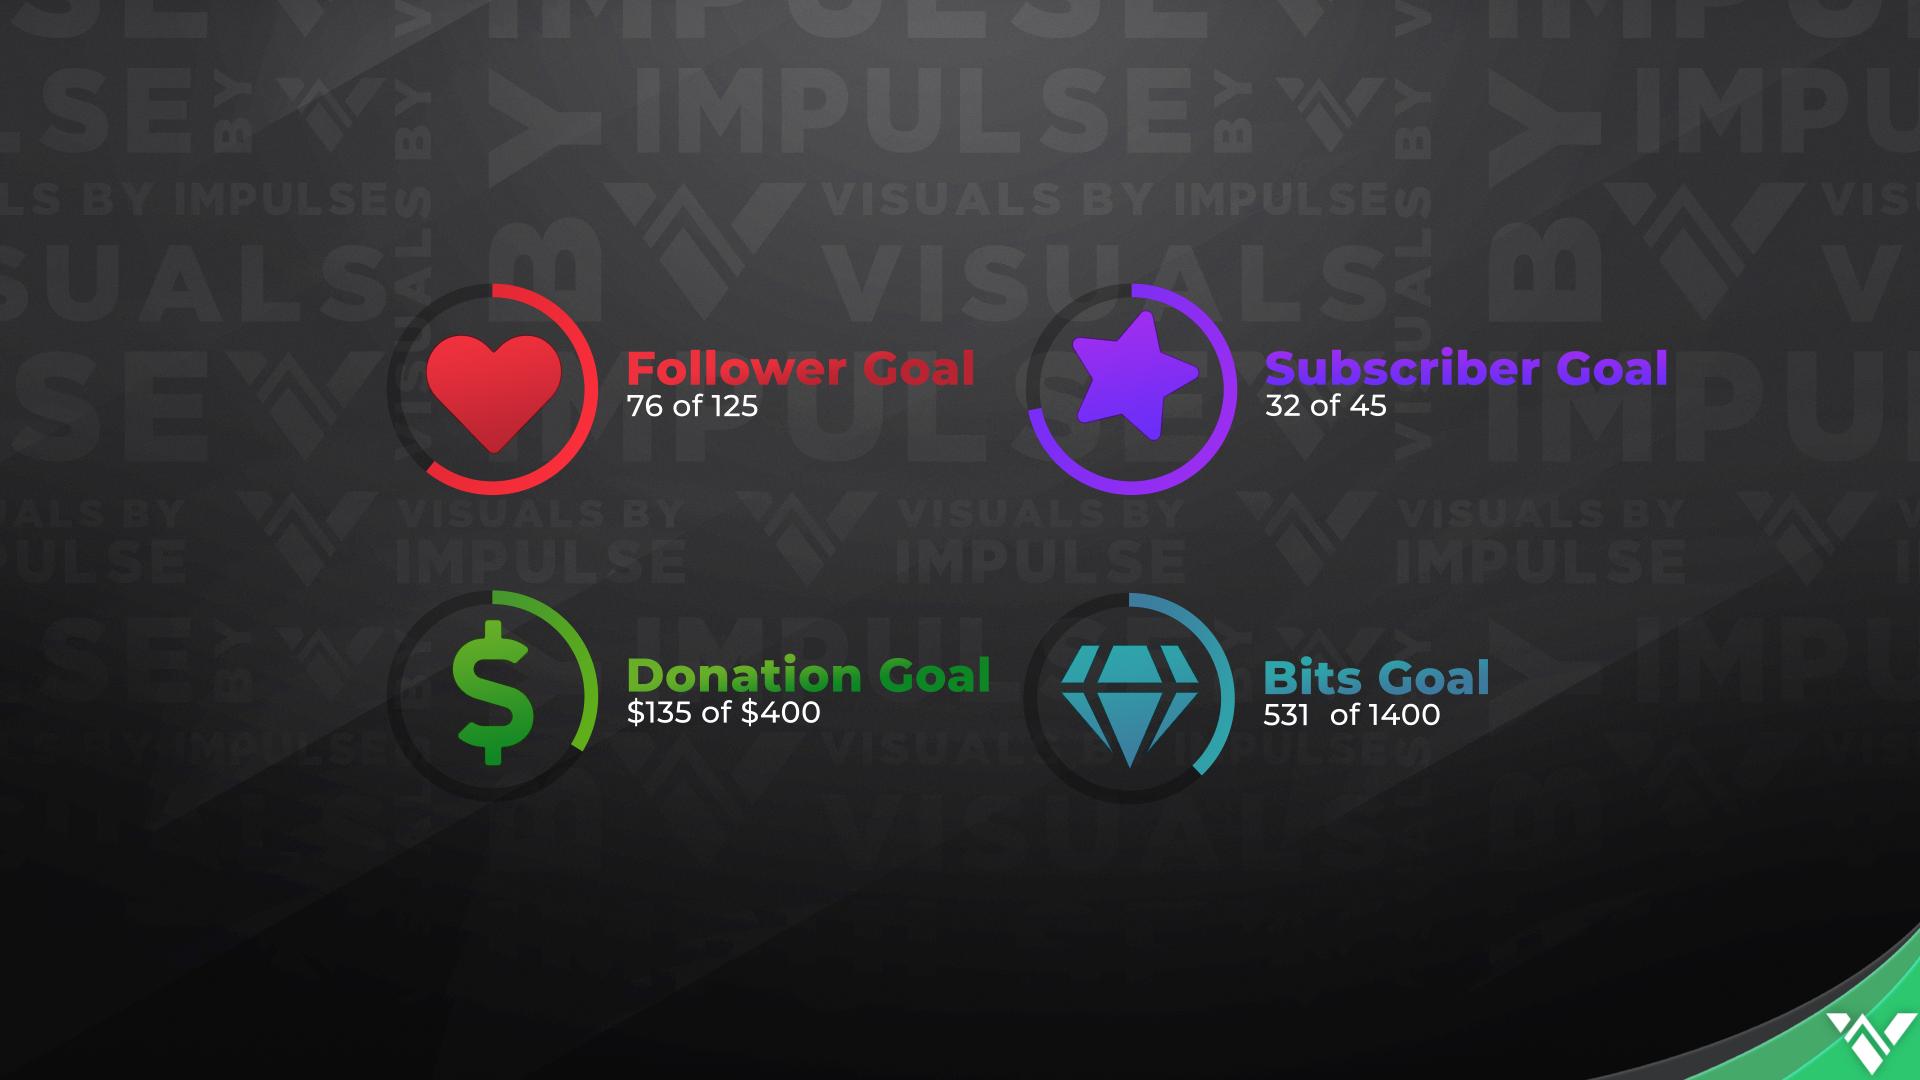 JellyUI Event List & Goal Widget Pack - Visuals by Impulse